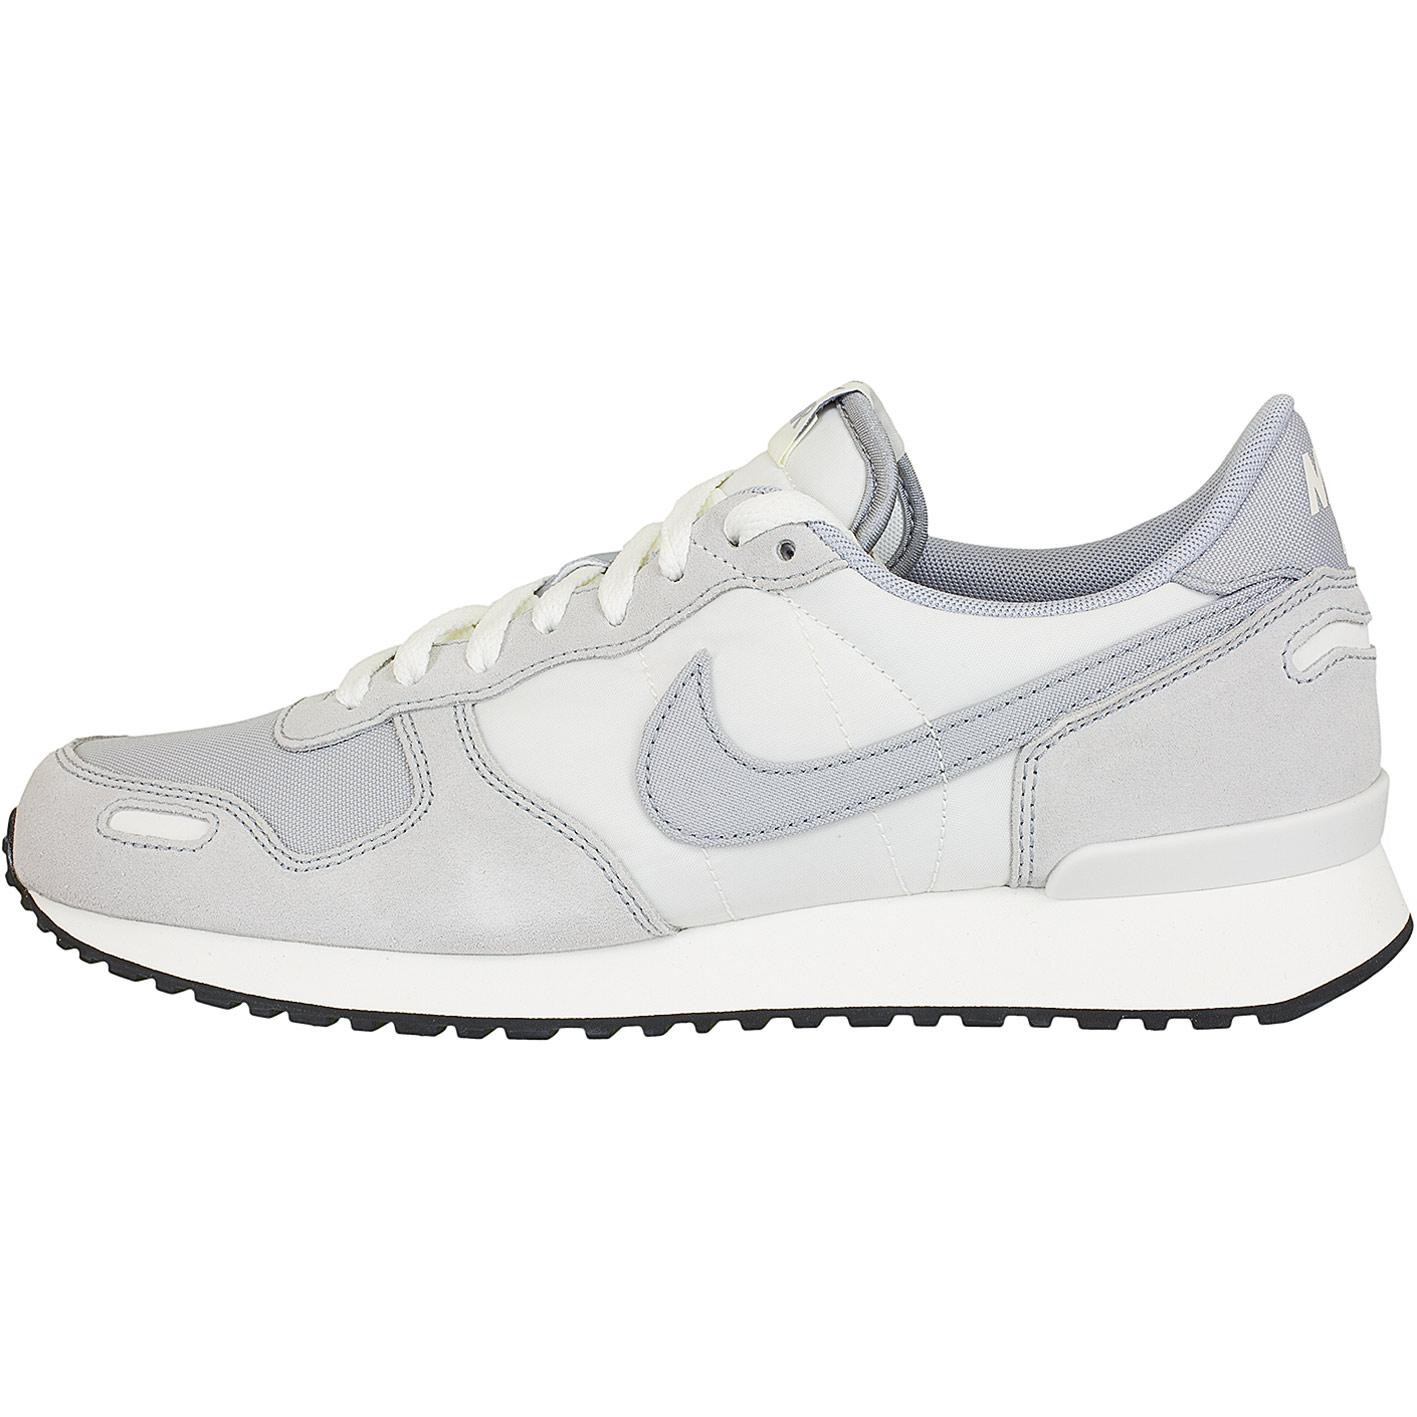 fa4f9ef1e182ca ☆ Nike Sneaker Air Vortex weiß grau - hier bestellen!